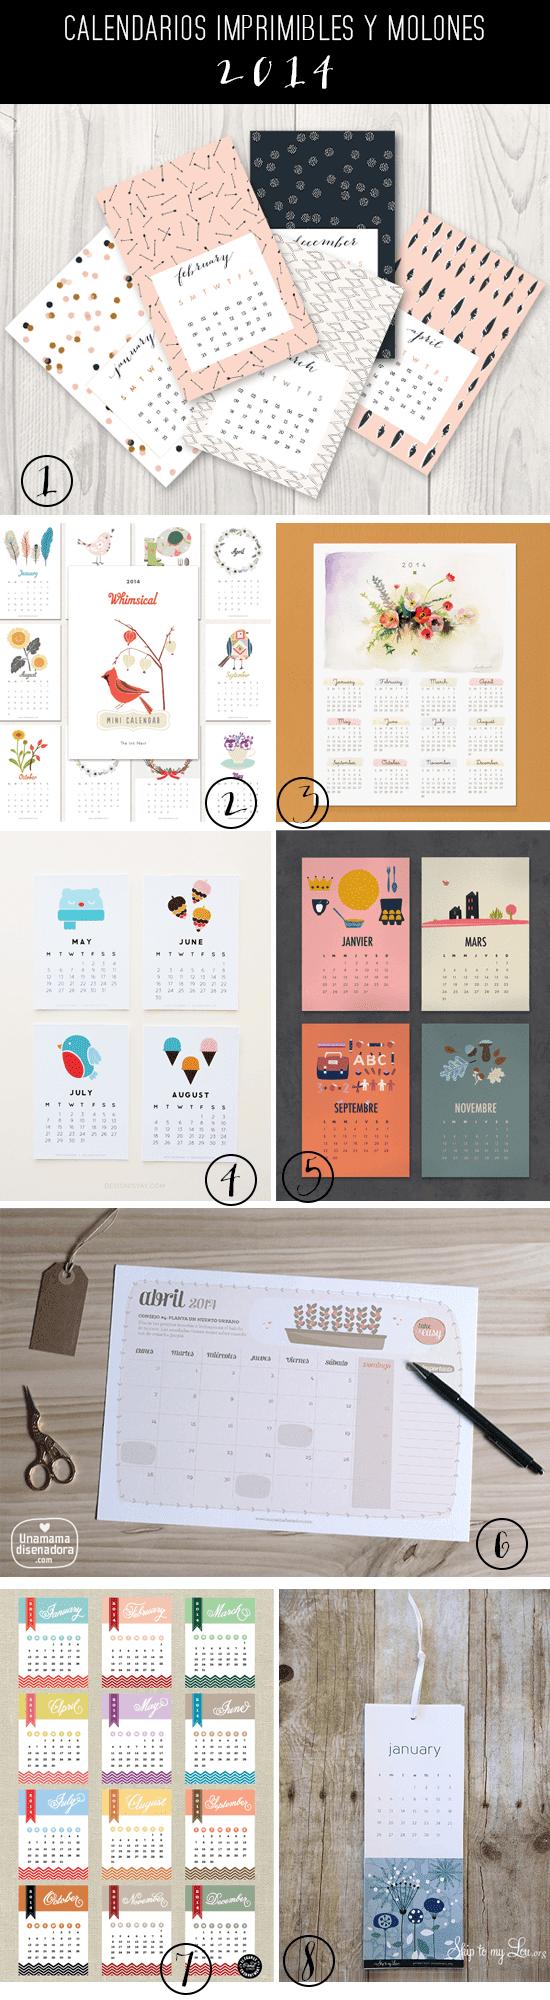 calendarios imprimibles 2014